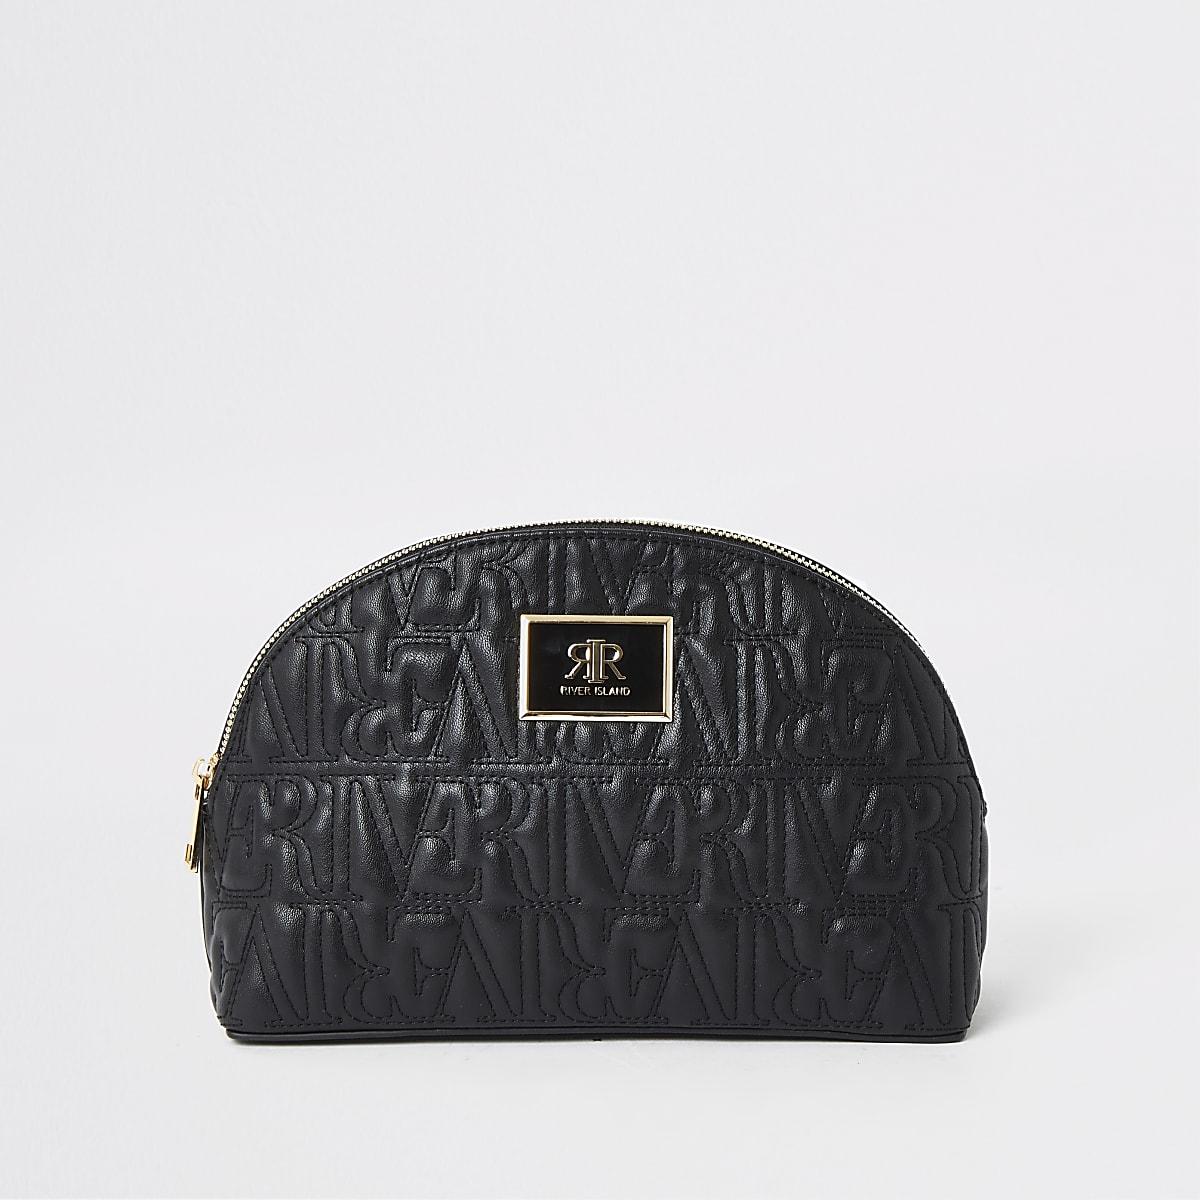 Zwarte make-uptas met RI-logo en rits in de bovenkant